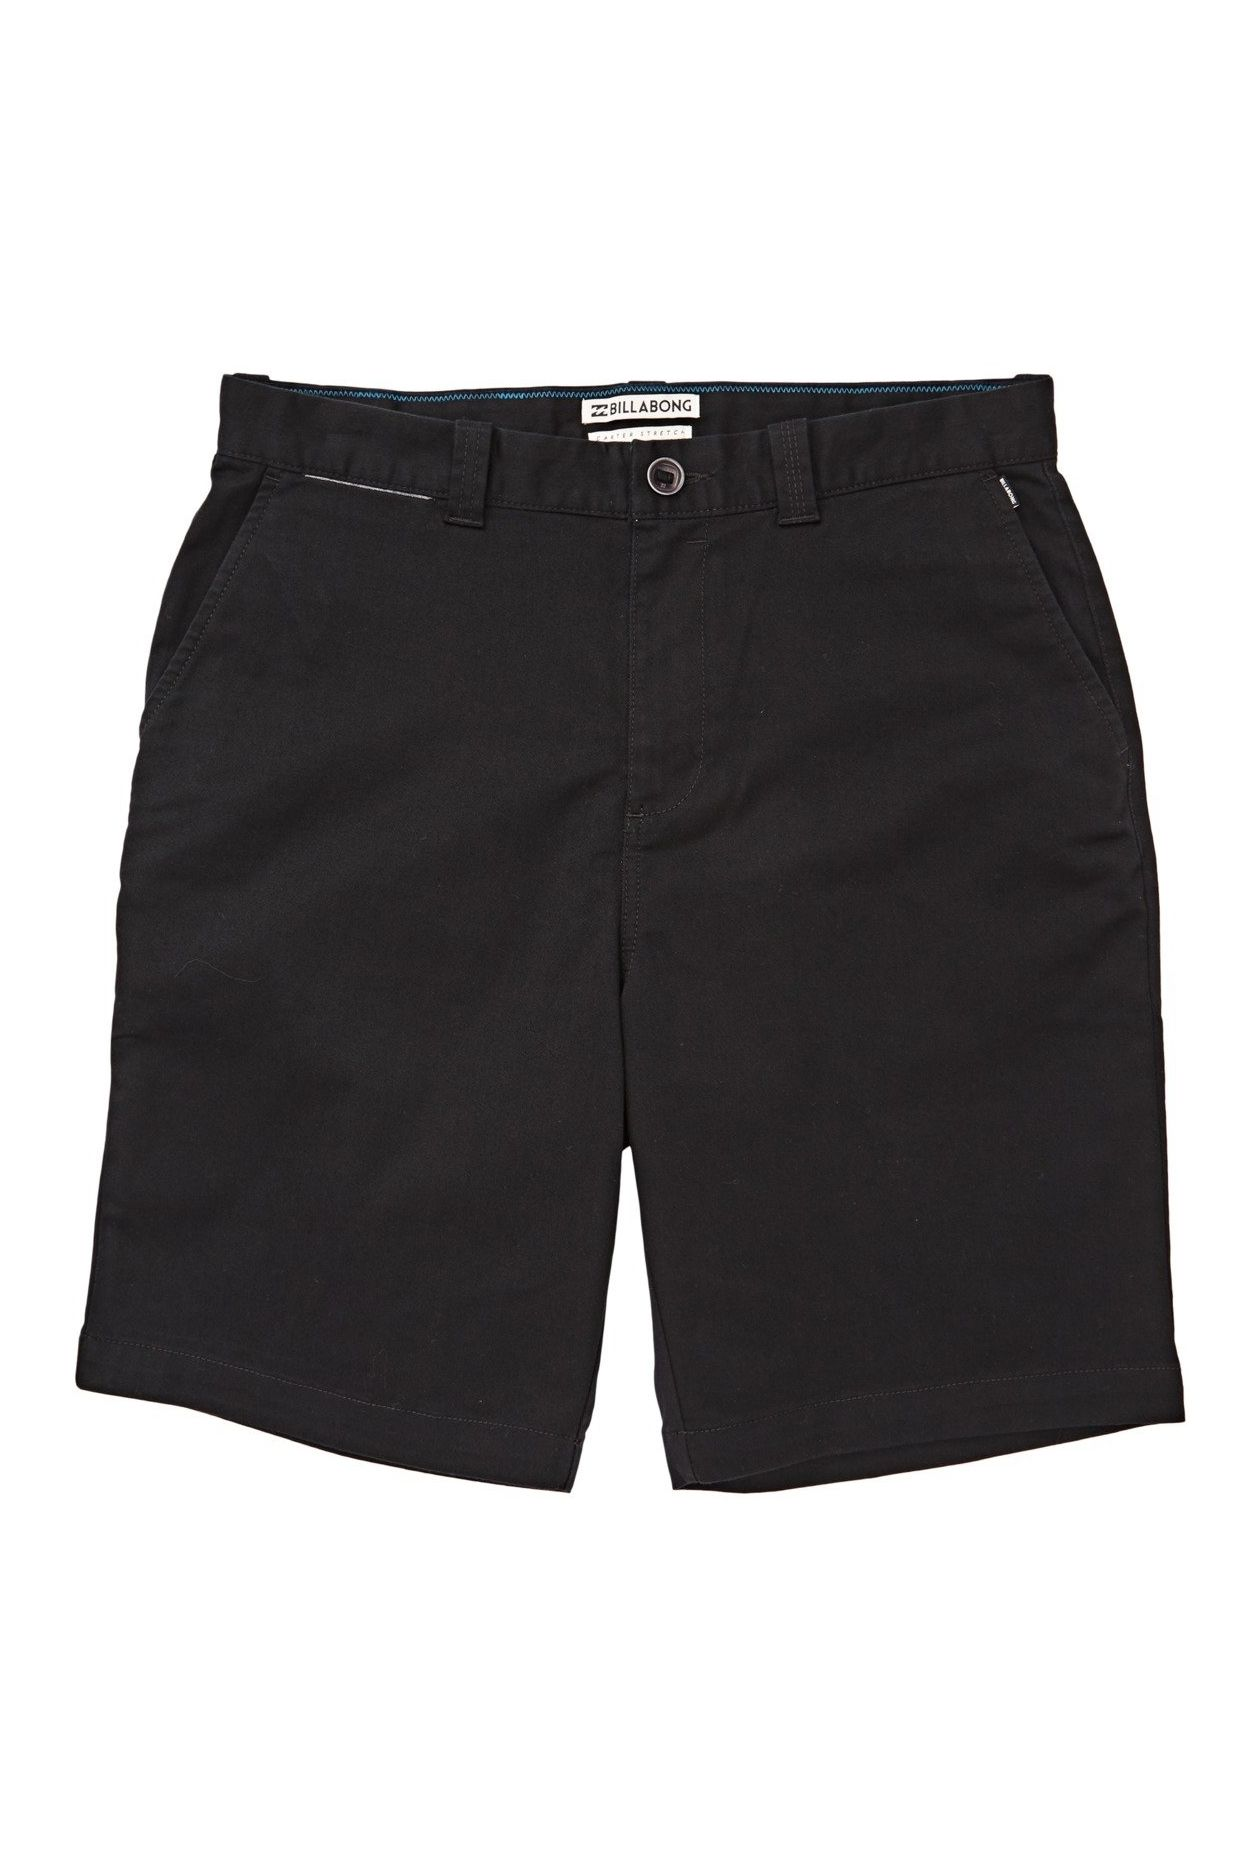 Billabong Walkshorts CARTER Black